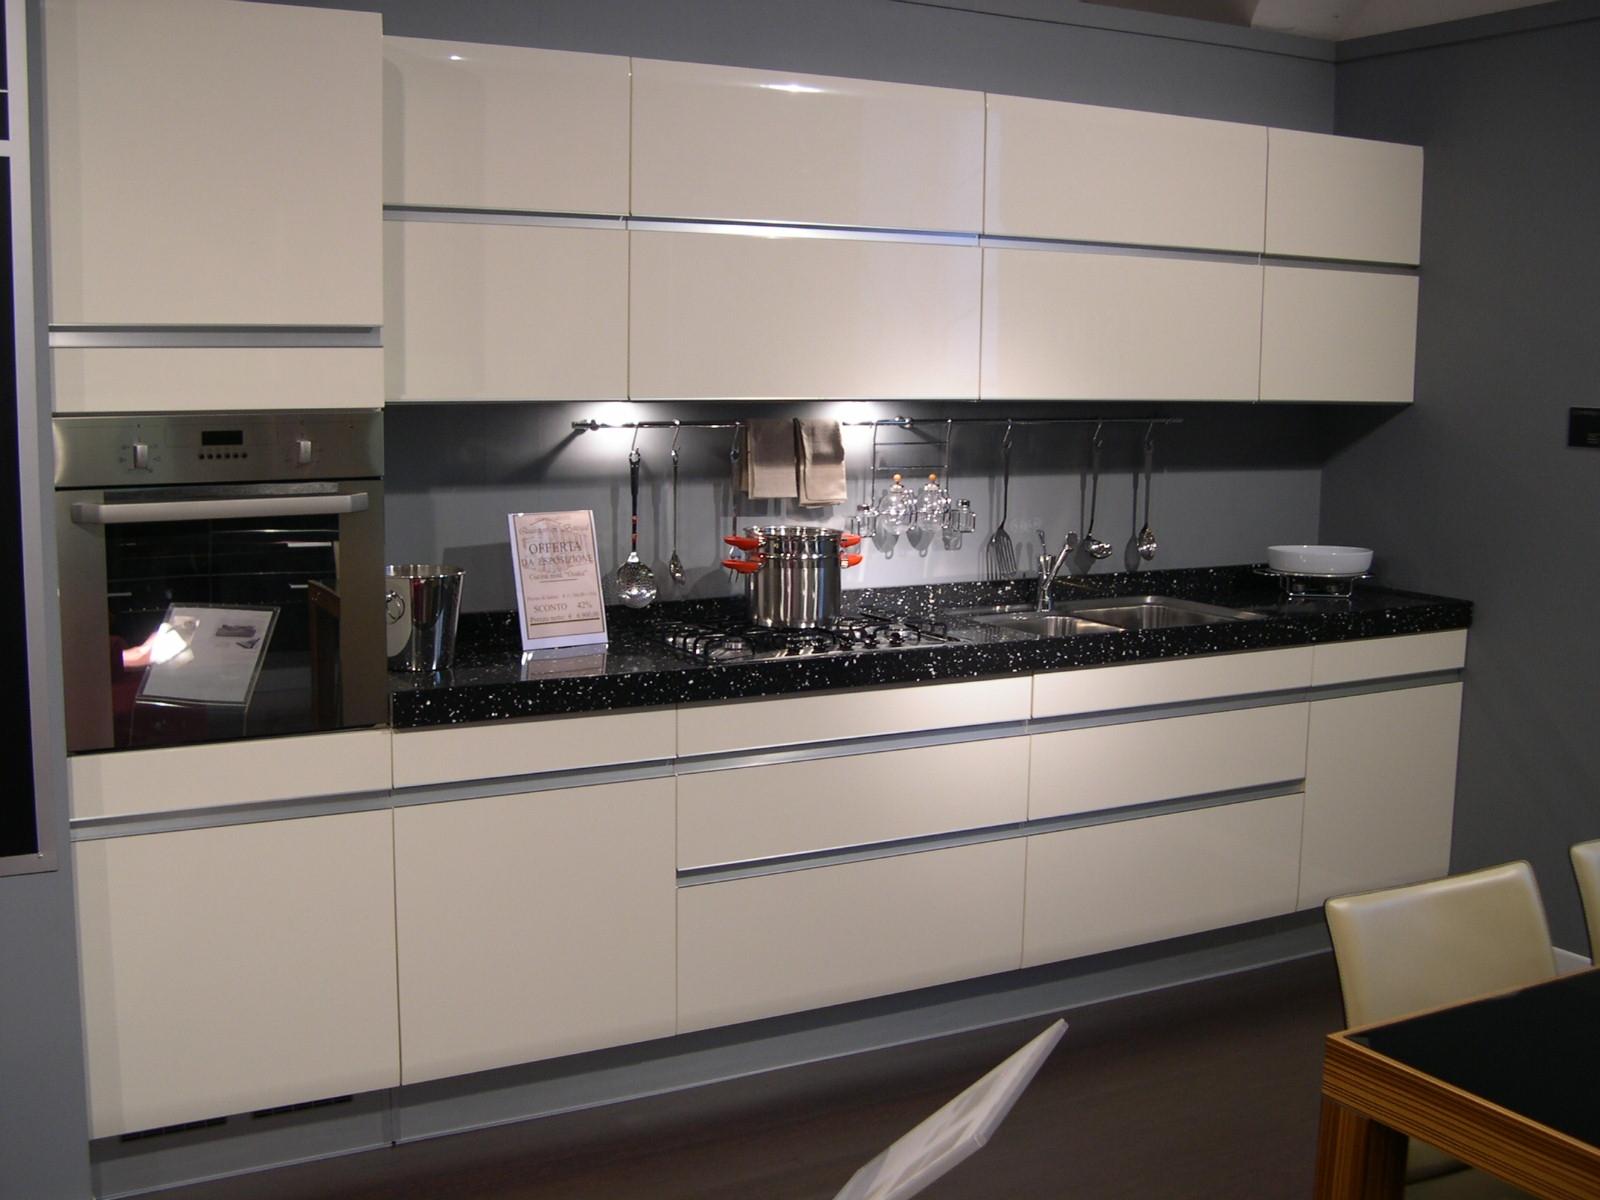 Cucine Moderne Torino. With Cucine Moderne Torino. Gallery Of Cucine ...